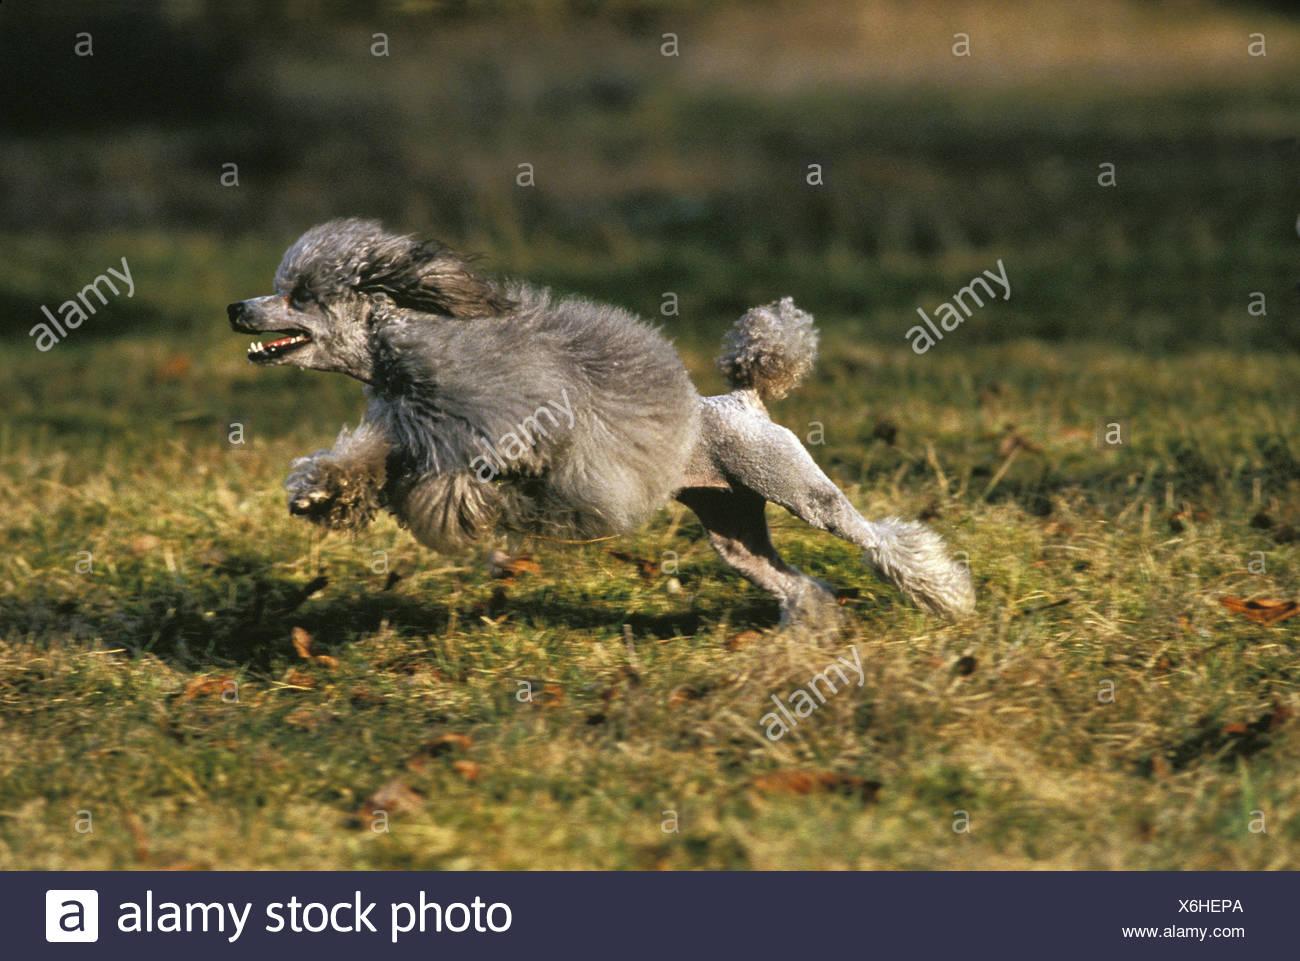 Grey Miniature Poodle Dog running - Stock Image